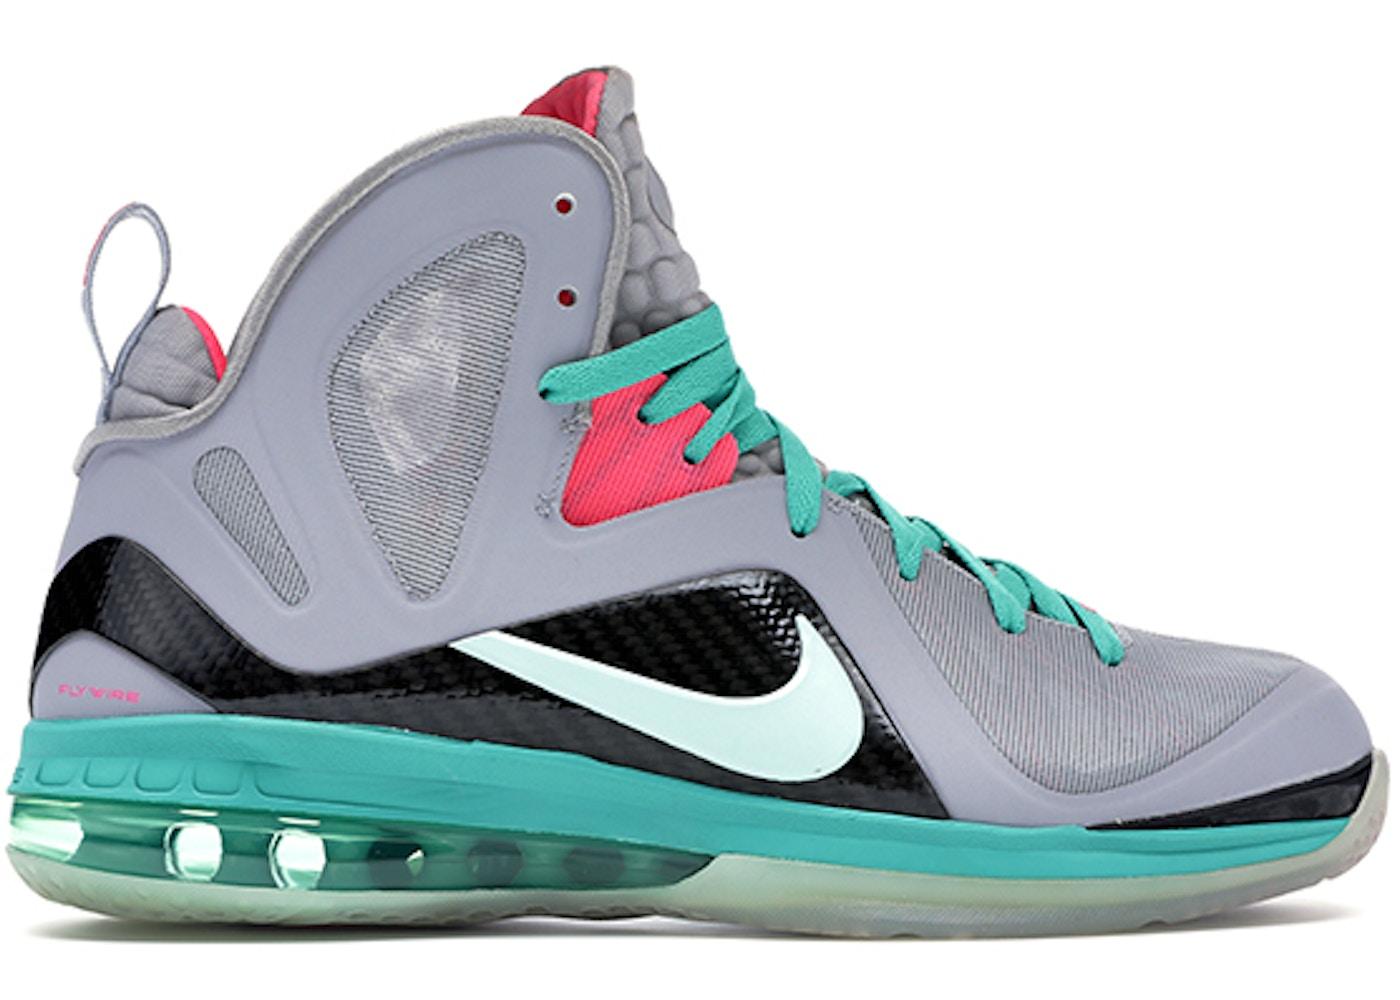 los angeles fa861 37a31 Nike LeBron 9 Shoes - Average Sale Price